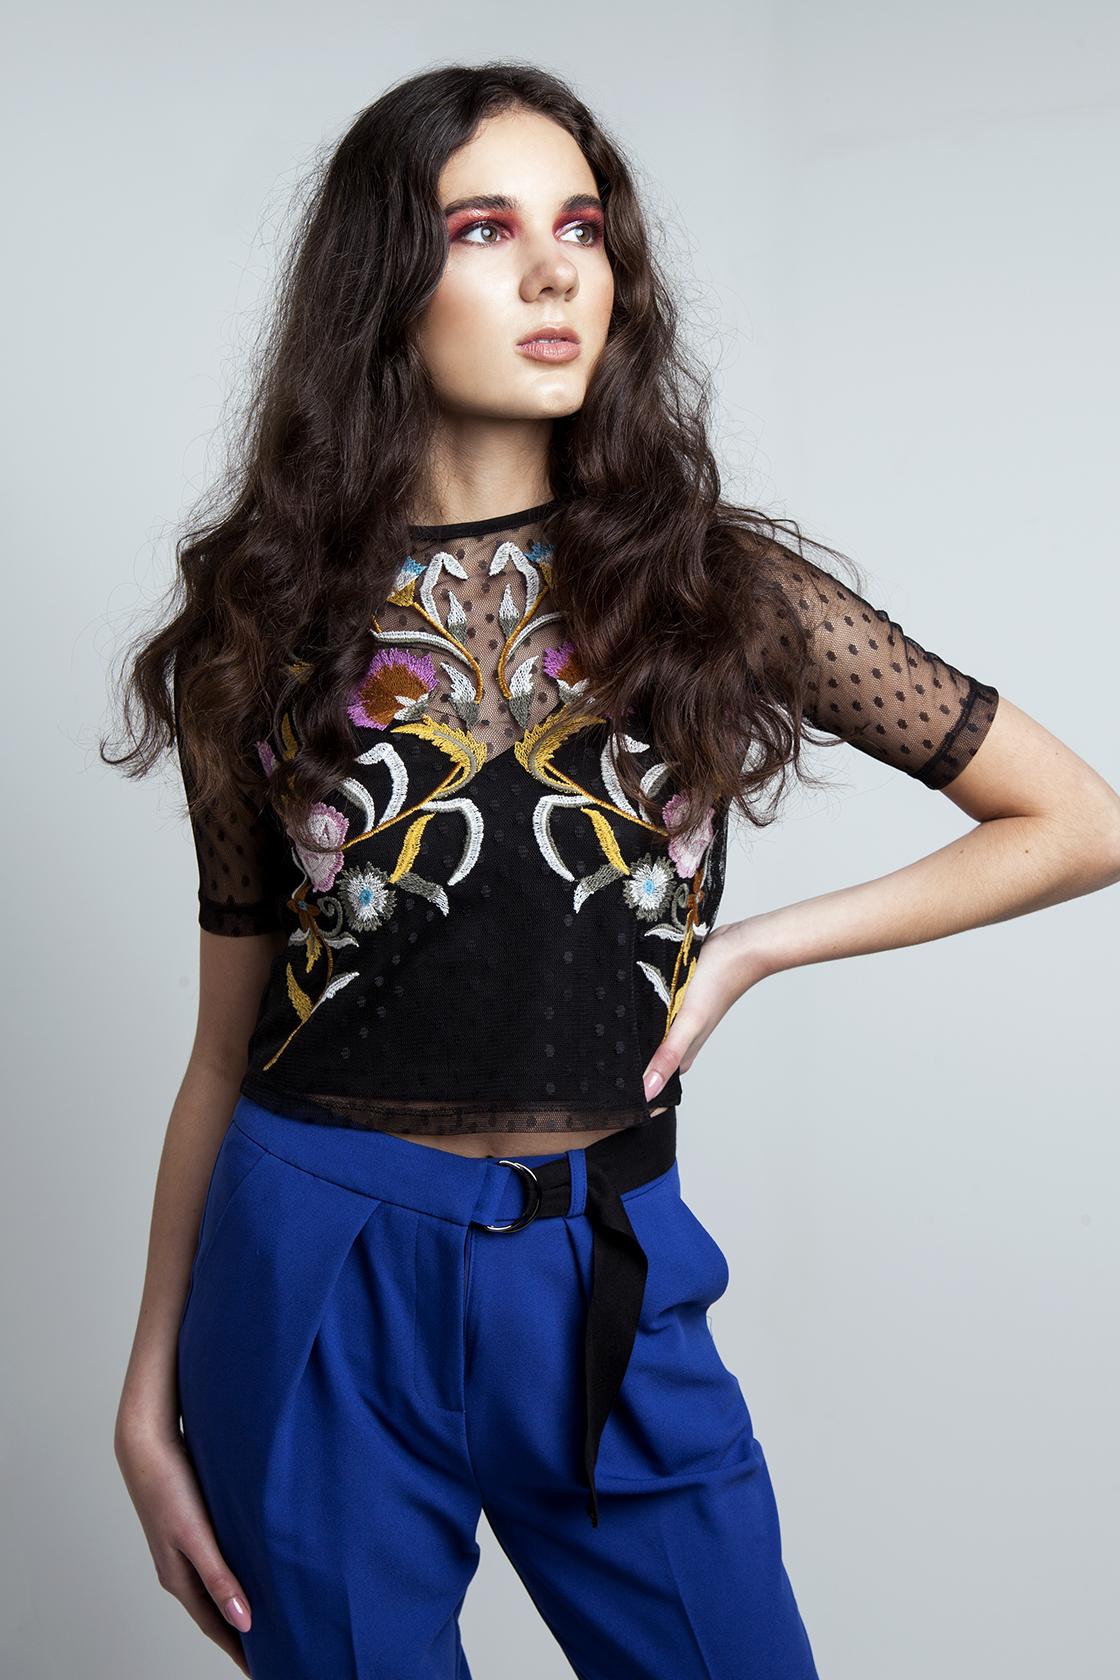 Shine-Model-Leeds-Harrogate-bridal-Suzannah-05.jpg#asset:44795